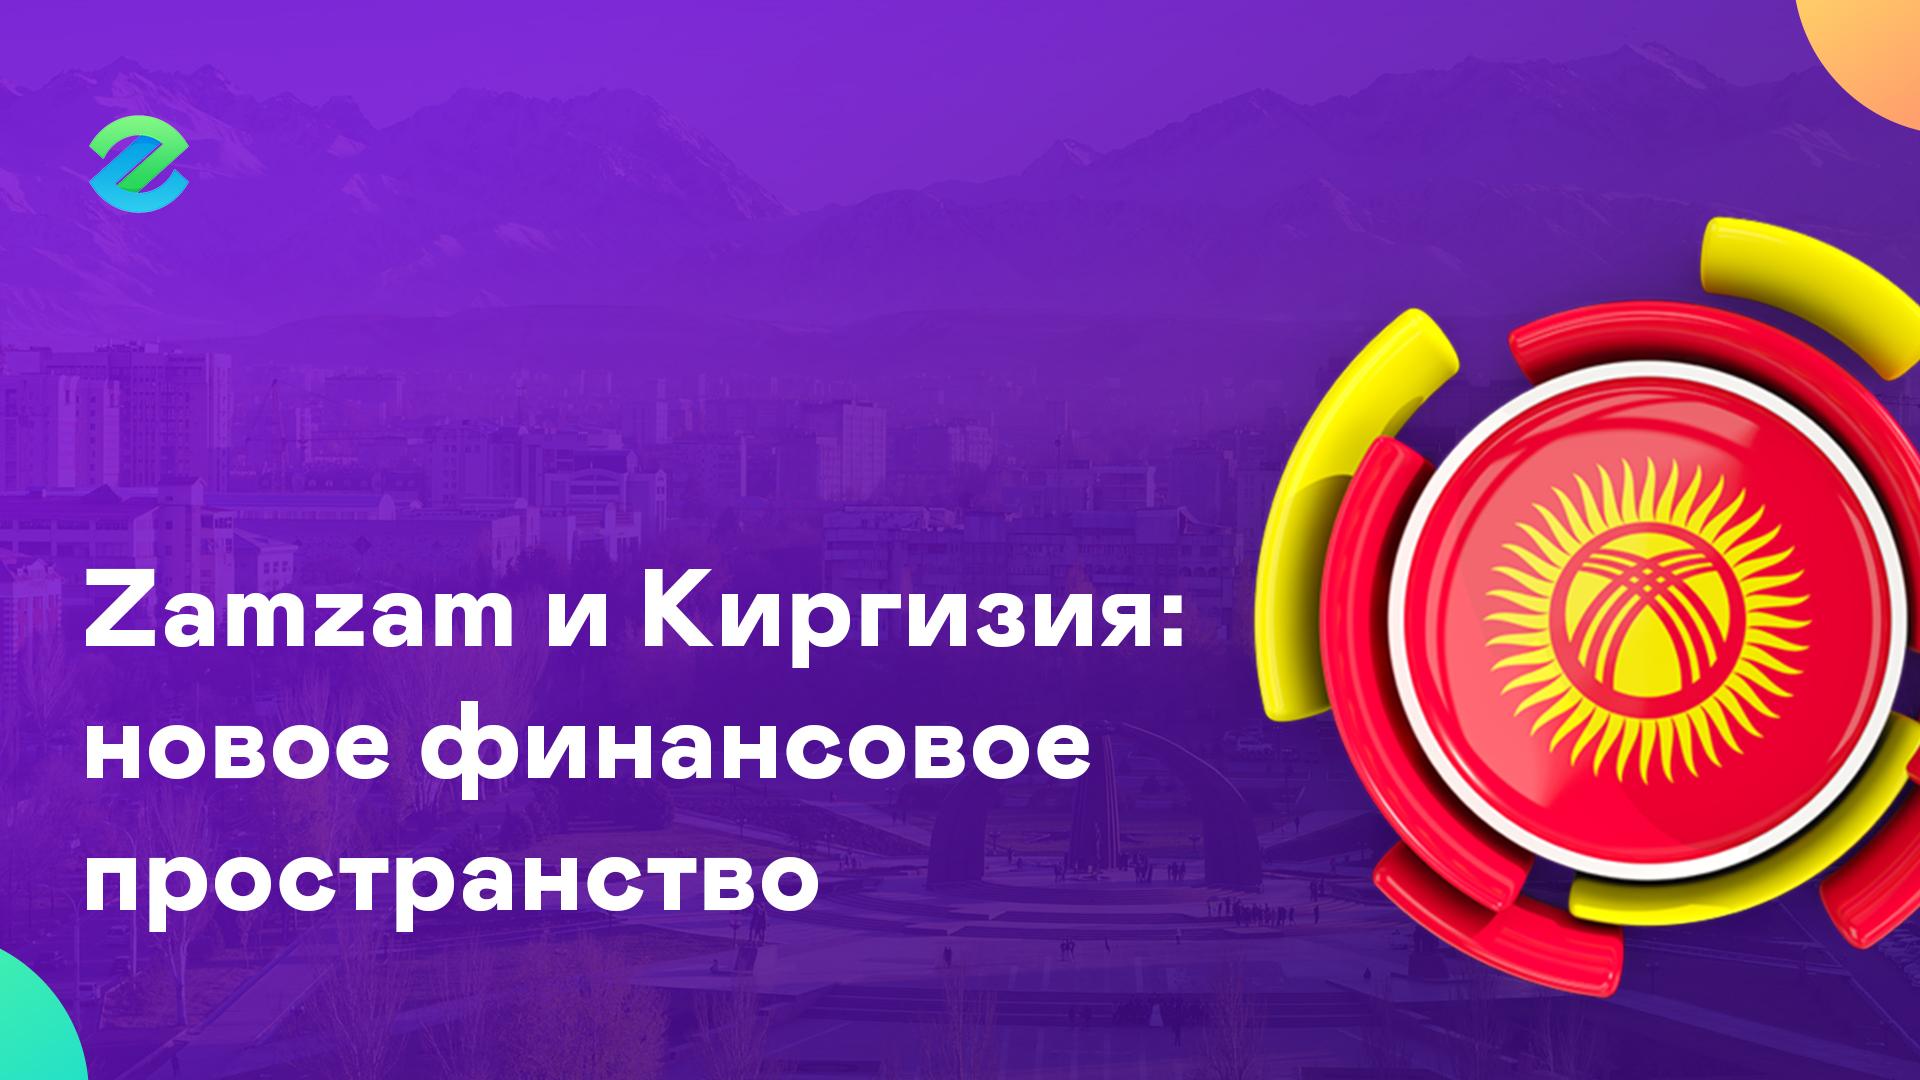 zamzam i kirgizija novoe finansovoe prostranstvo - Zamzam и Киргизия: новое финансовое пространство